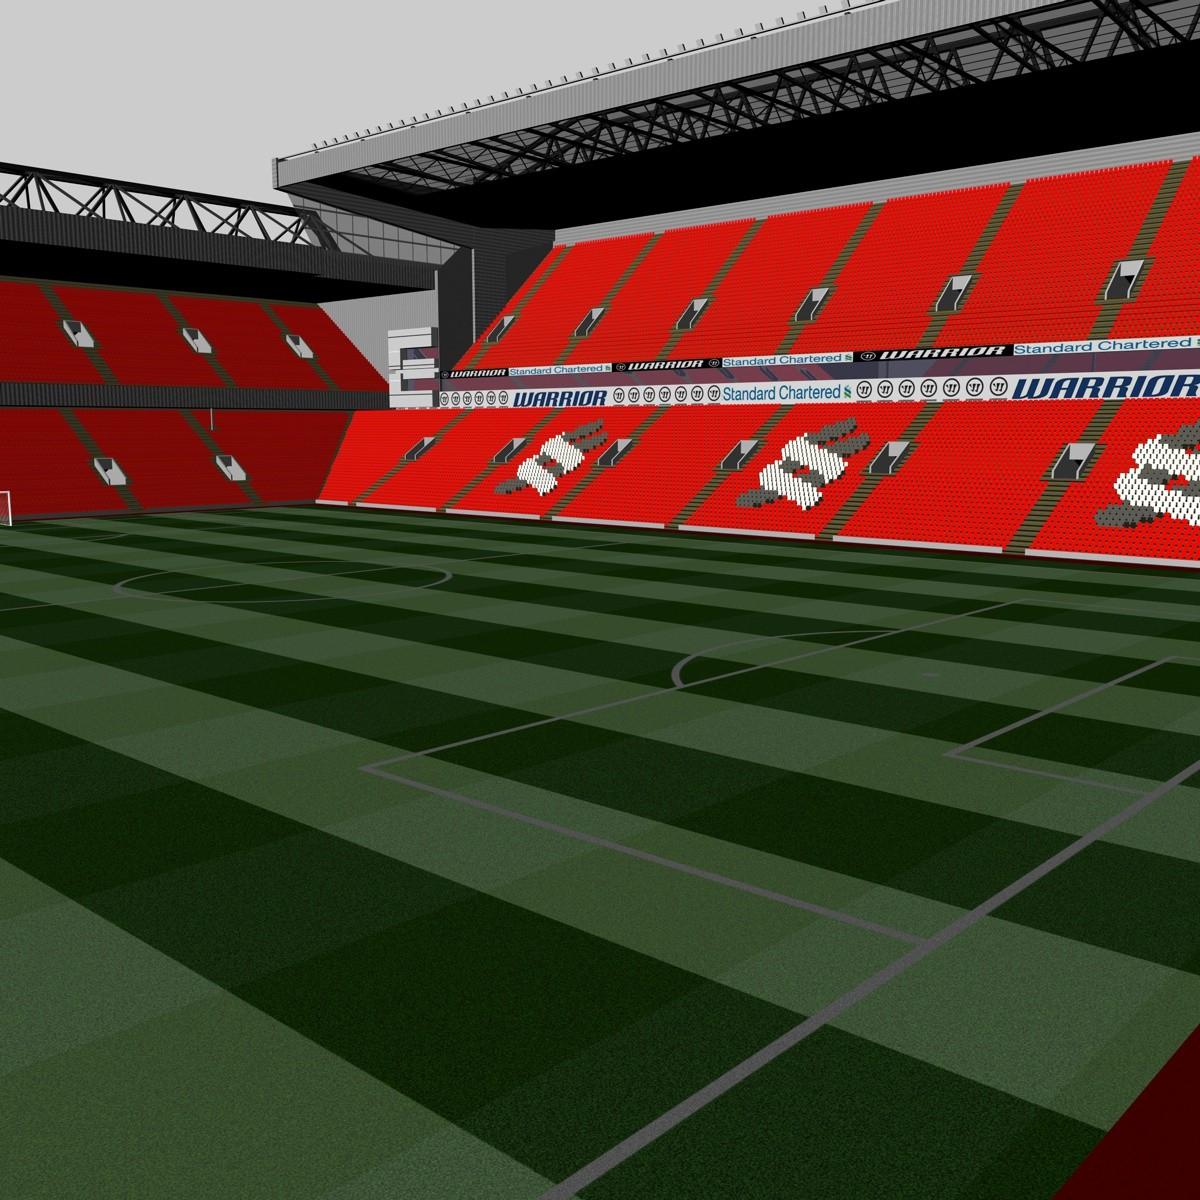 Anfield0.jpg